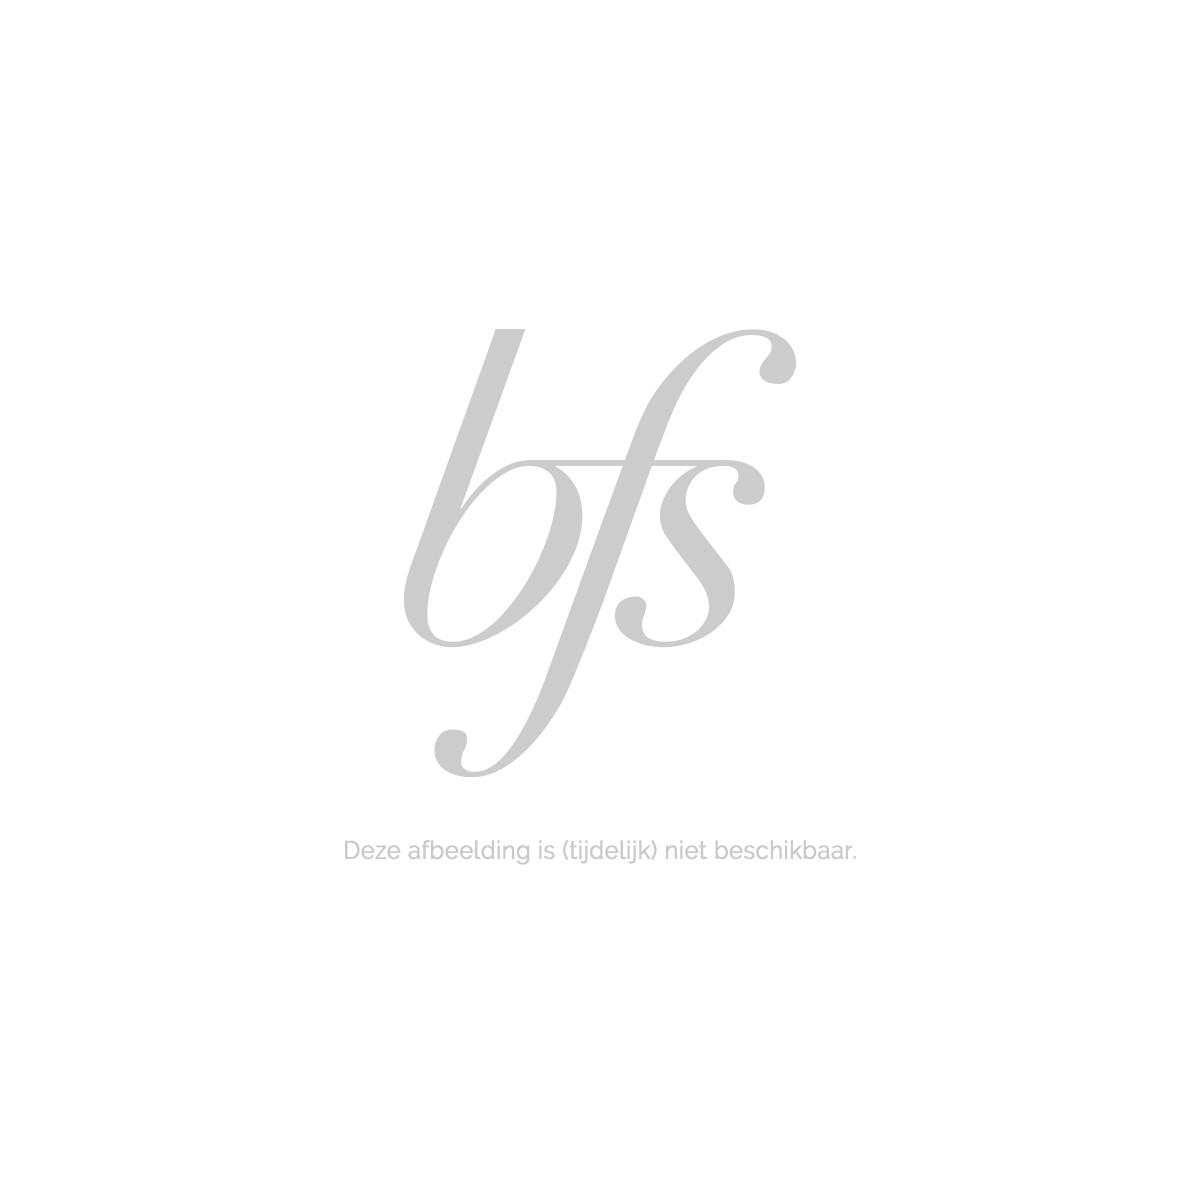 Afbeelding van Beautyblender Original Kit Sponsjes Make up